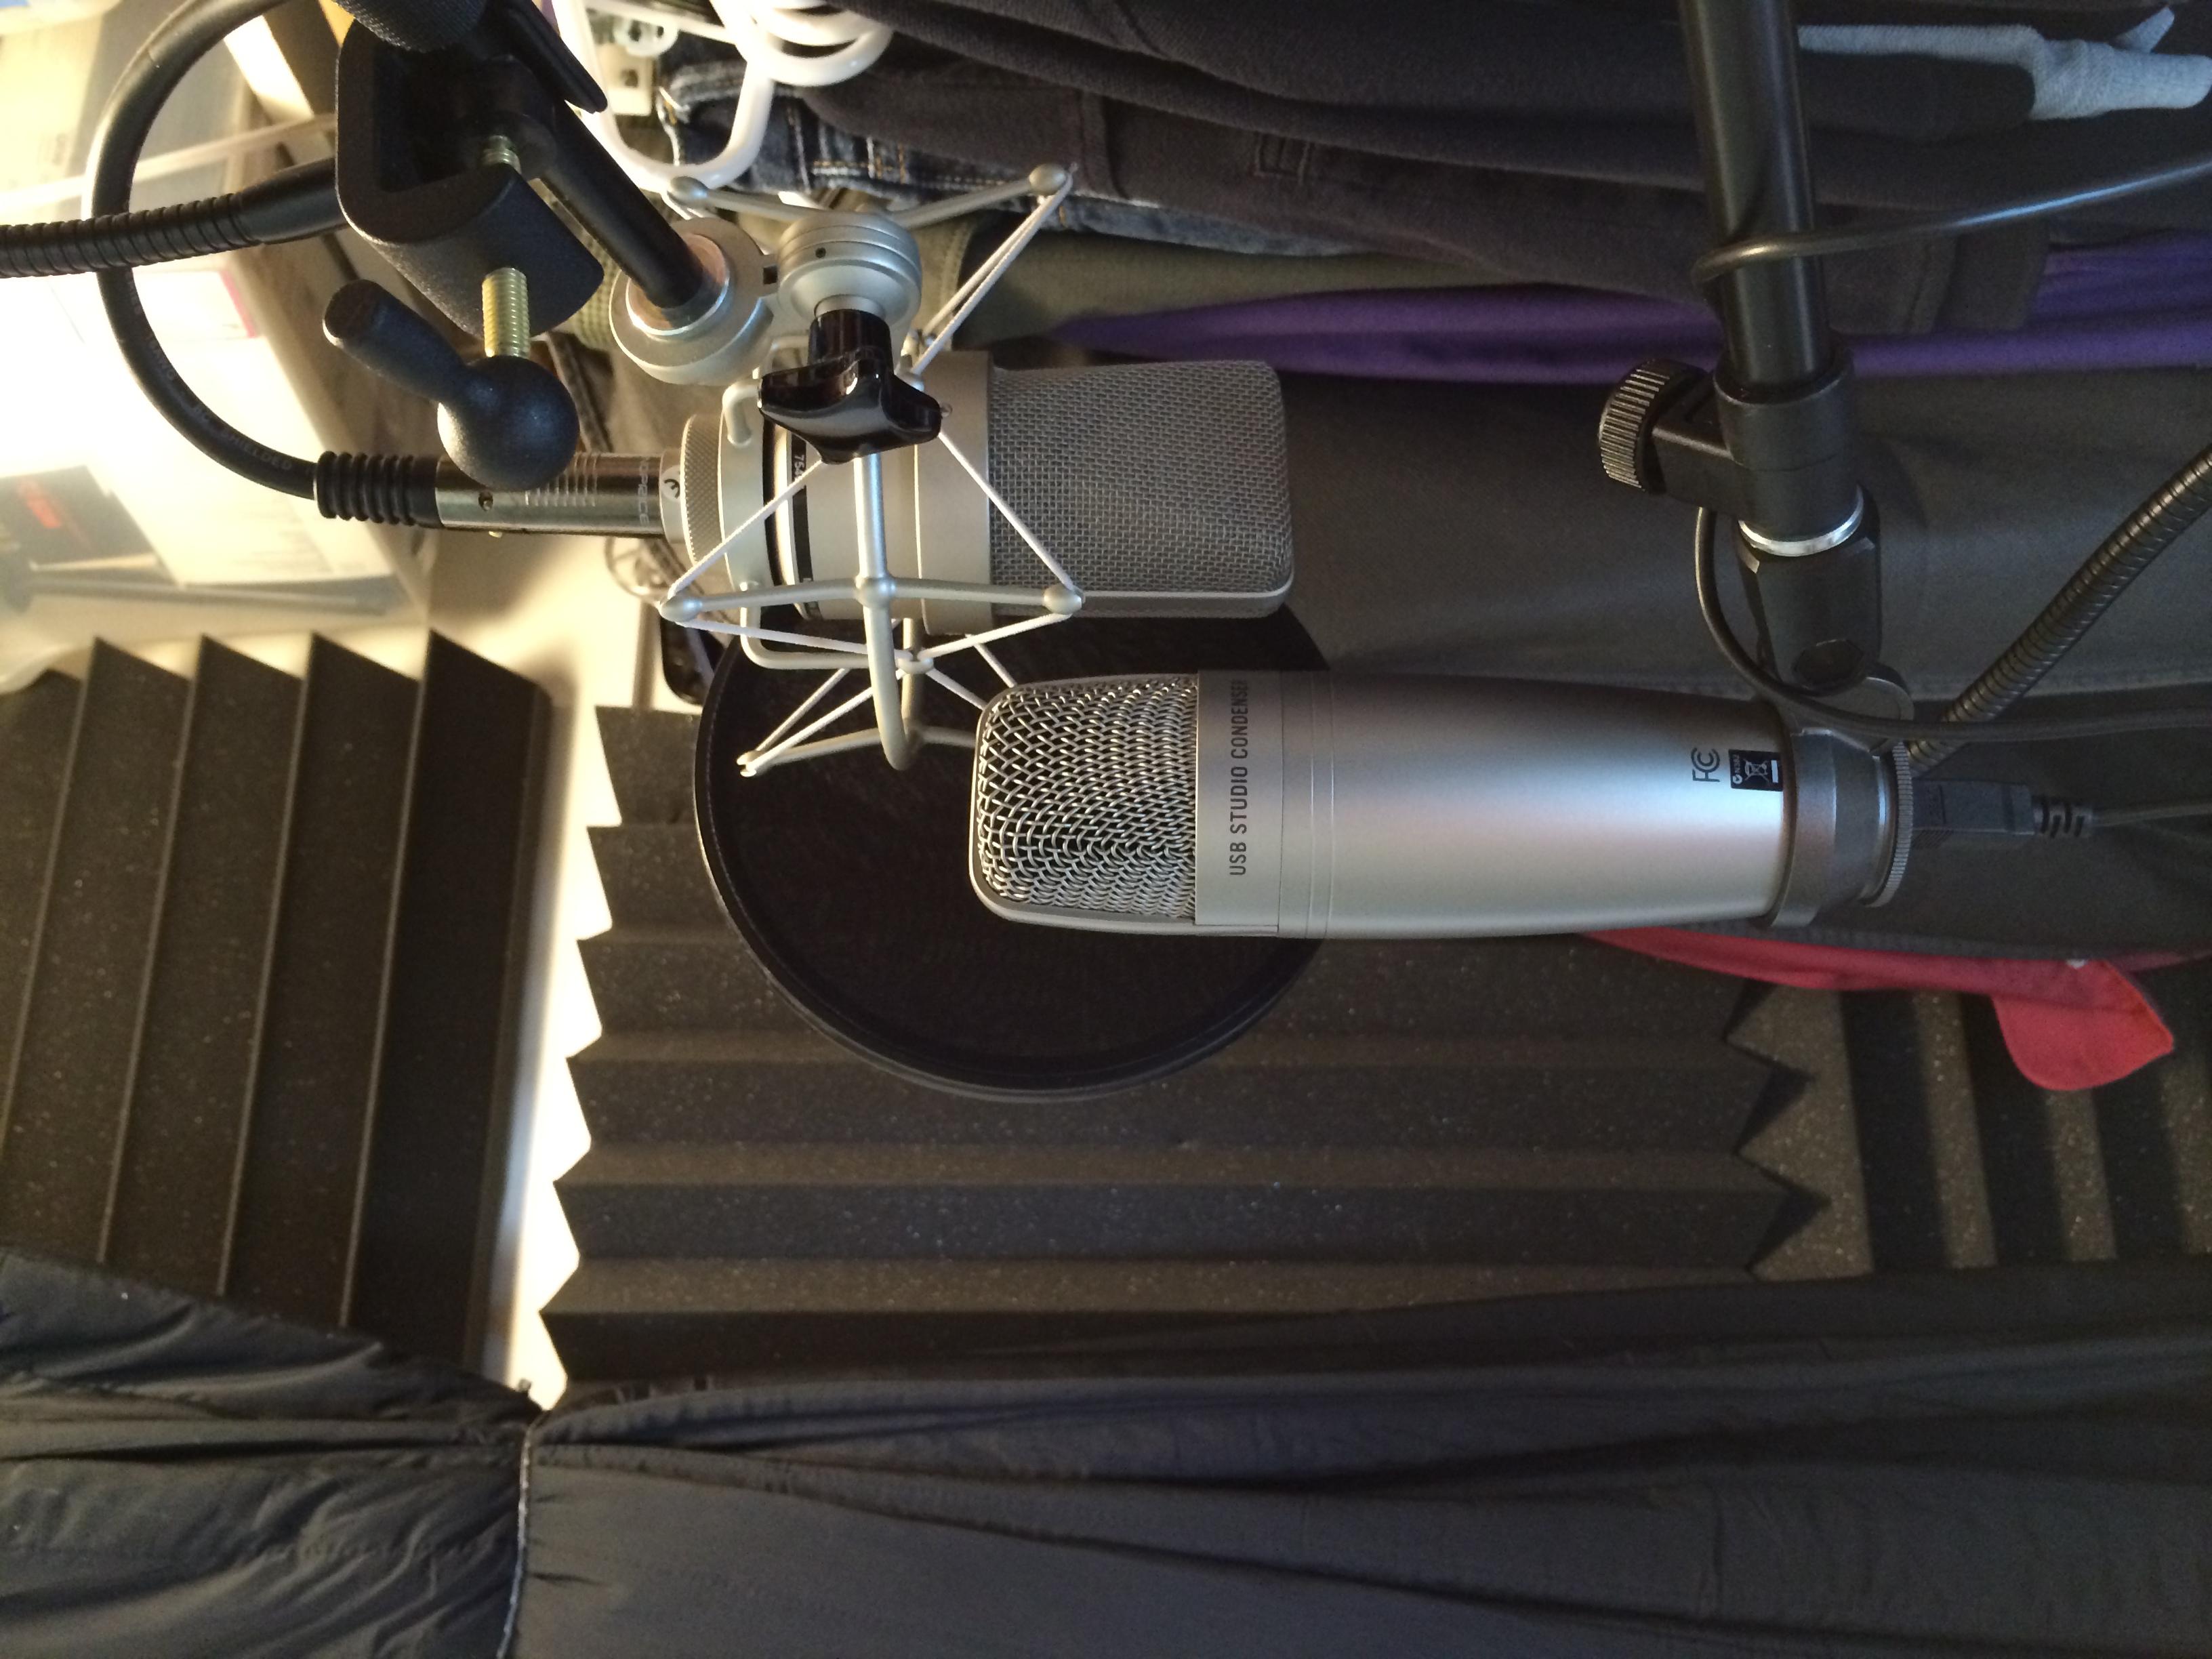 Samson C01u Pro Usb Microphone Review The Gadgeteer